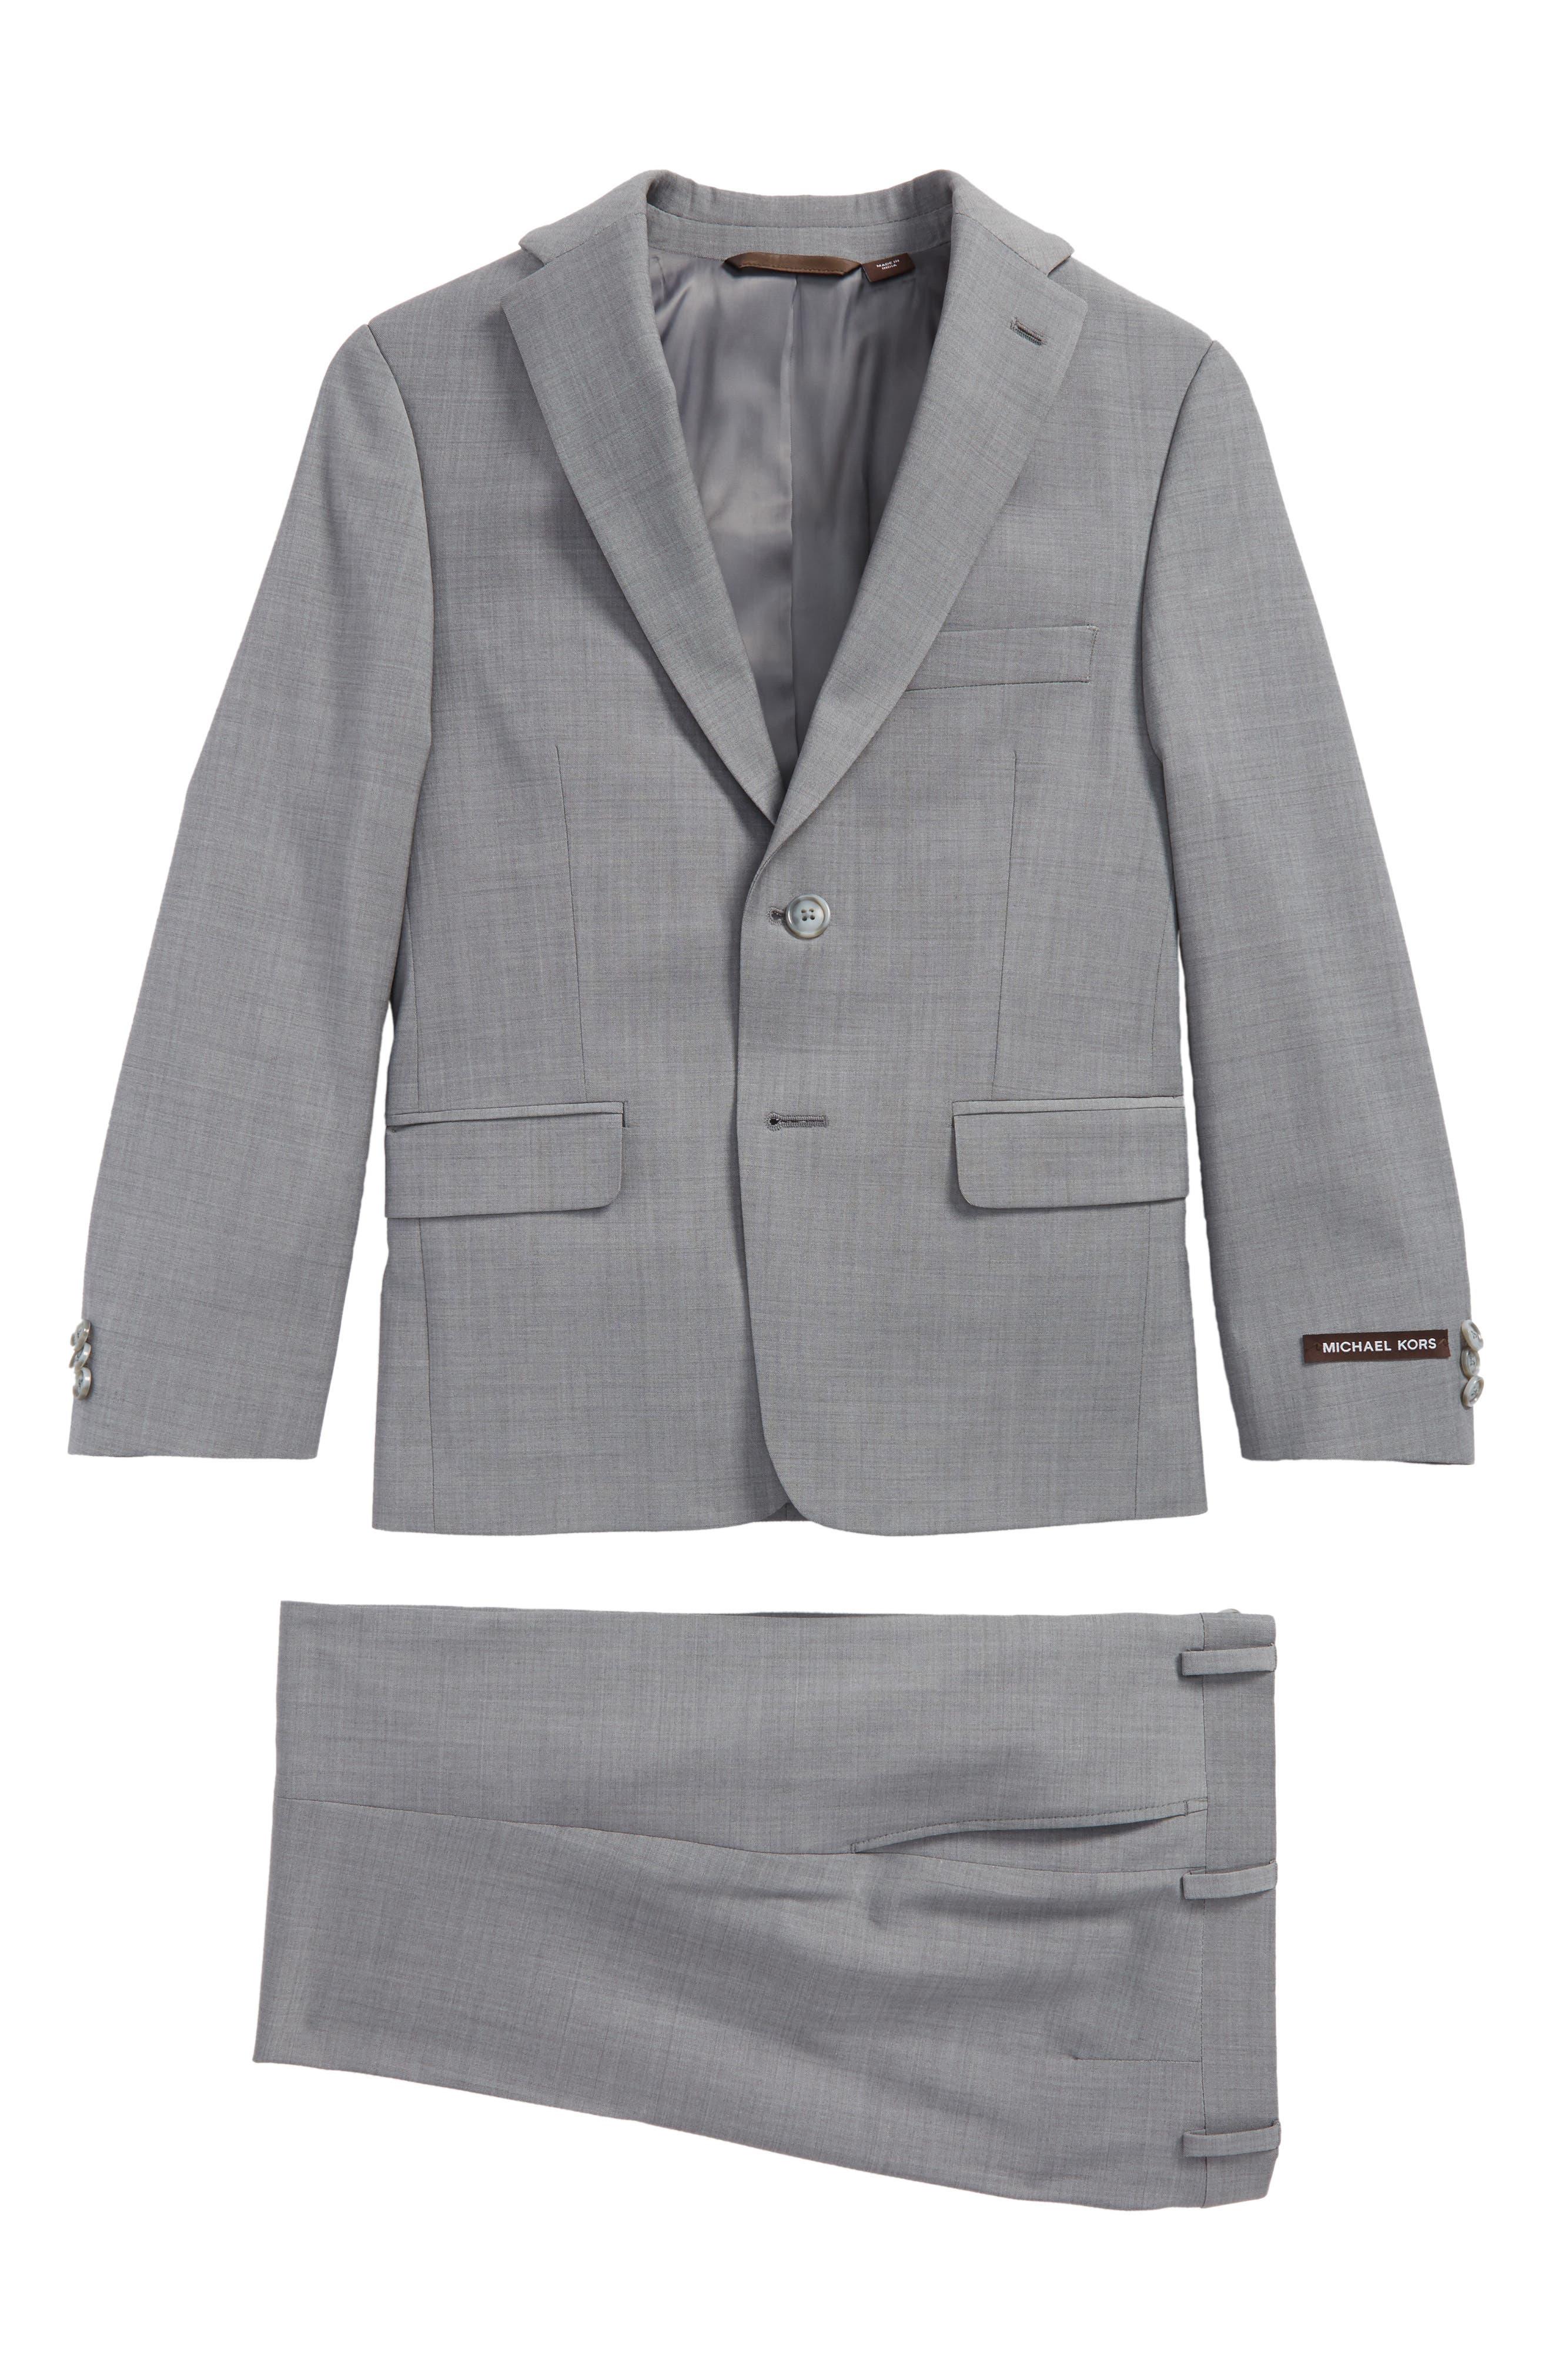 MICHAEL KORS Stretch Wool Suit, Main, color, LIGHT GREY